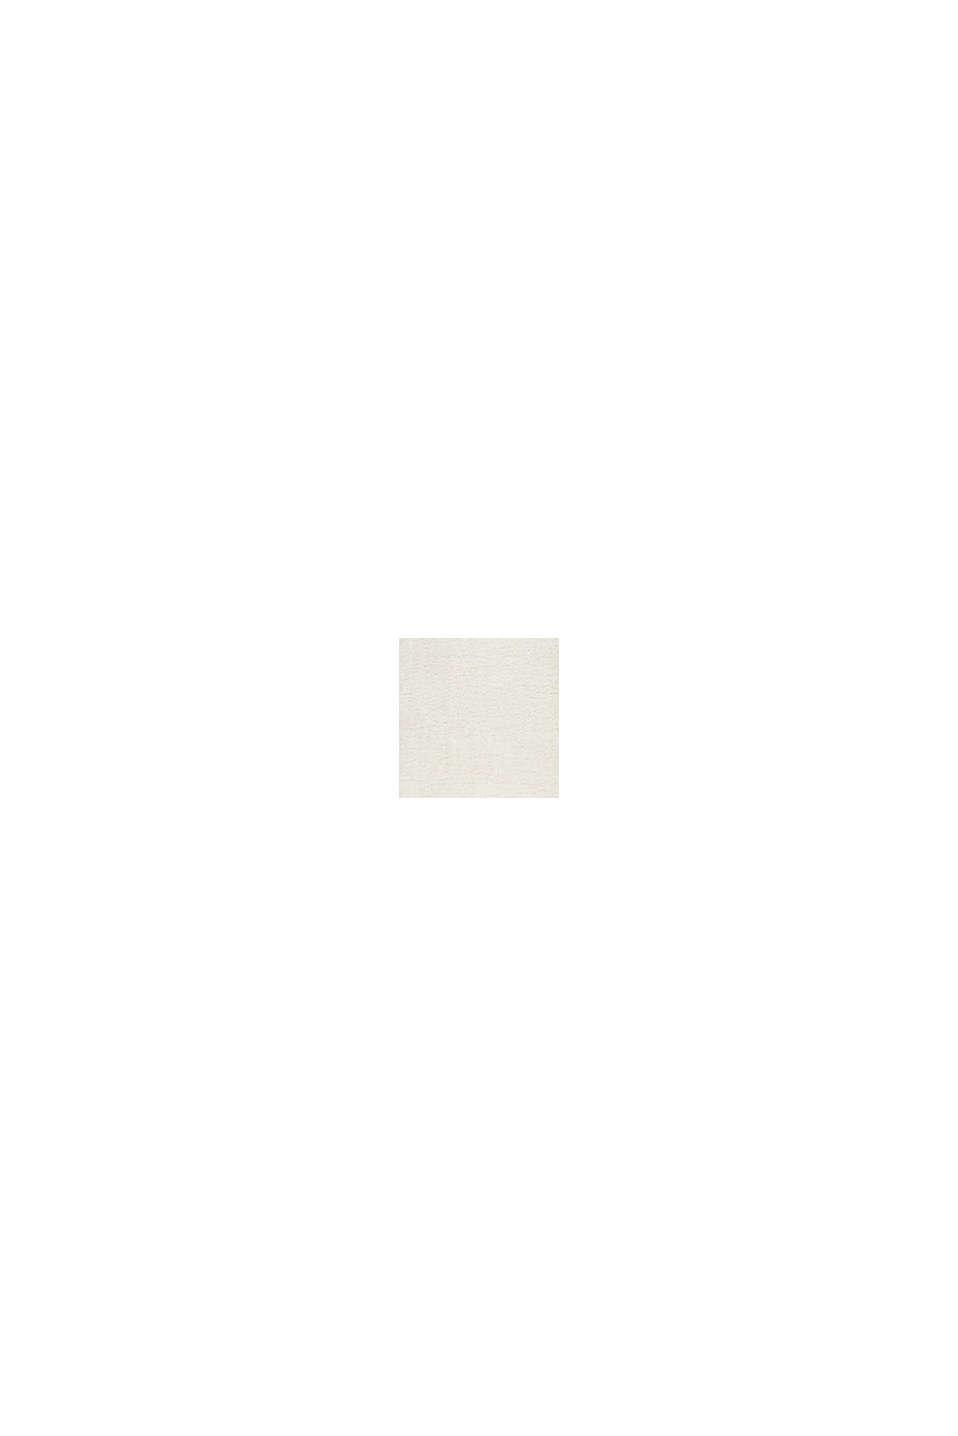 Flauschiger Langflor-Teppich, WHITE, swatch